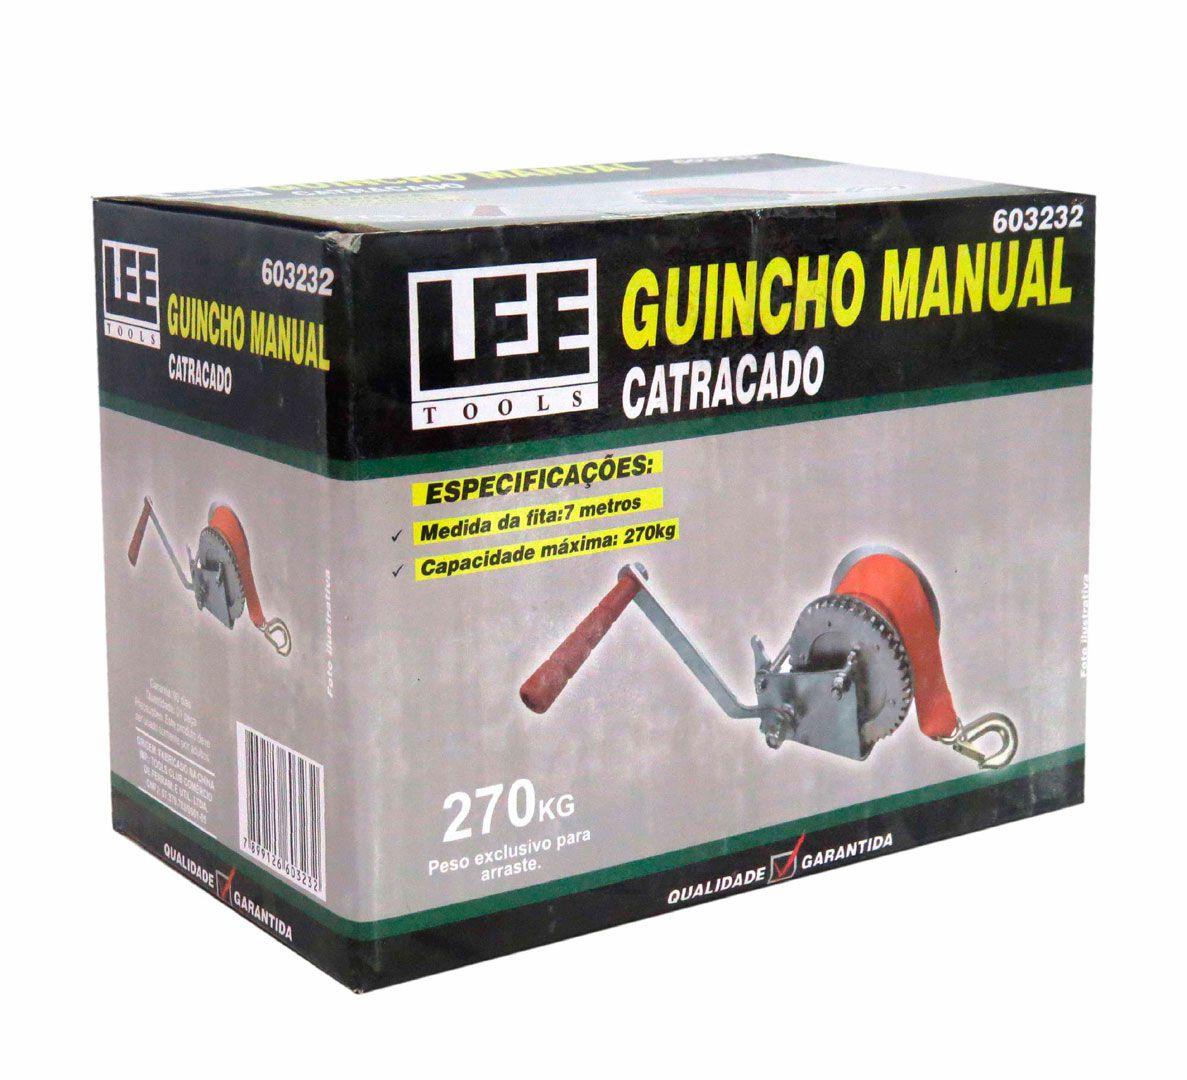 Guincho Manual 270kg Catracado De Arraste Com Fita Reboque